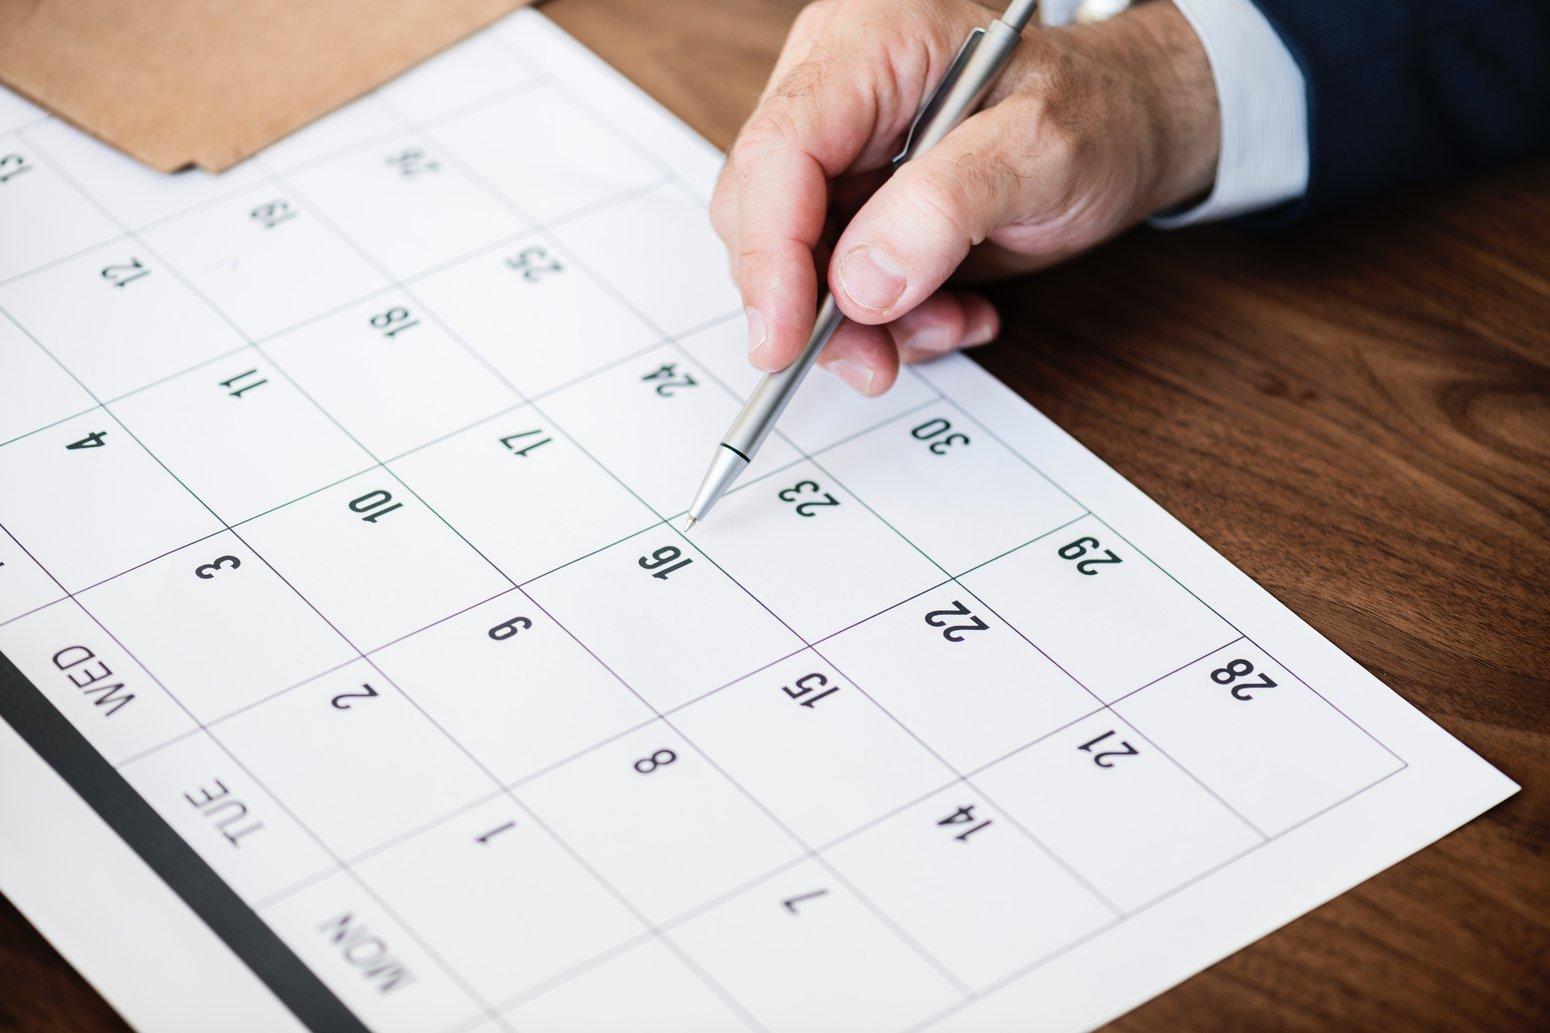 calendar-close-up-dates-862731